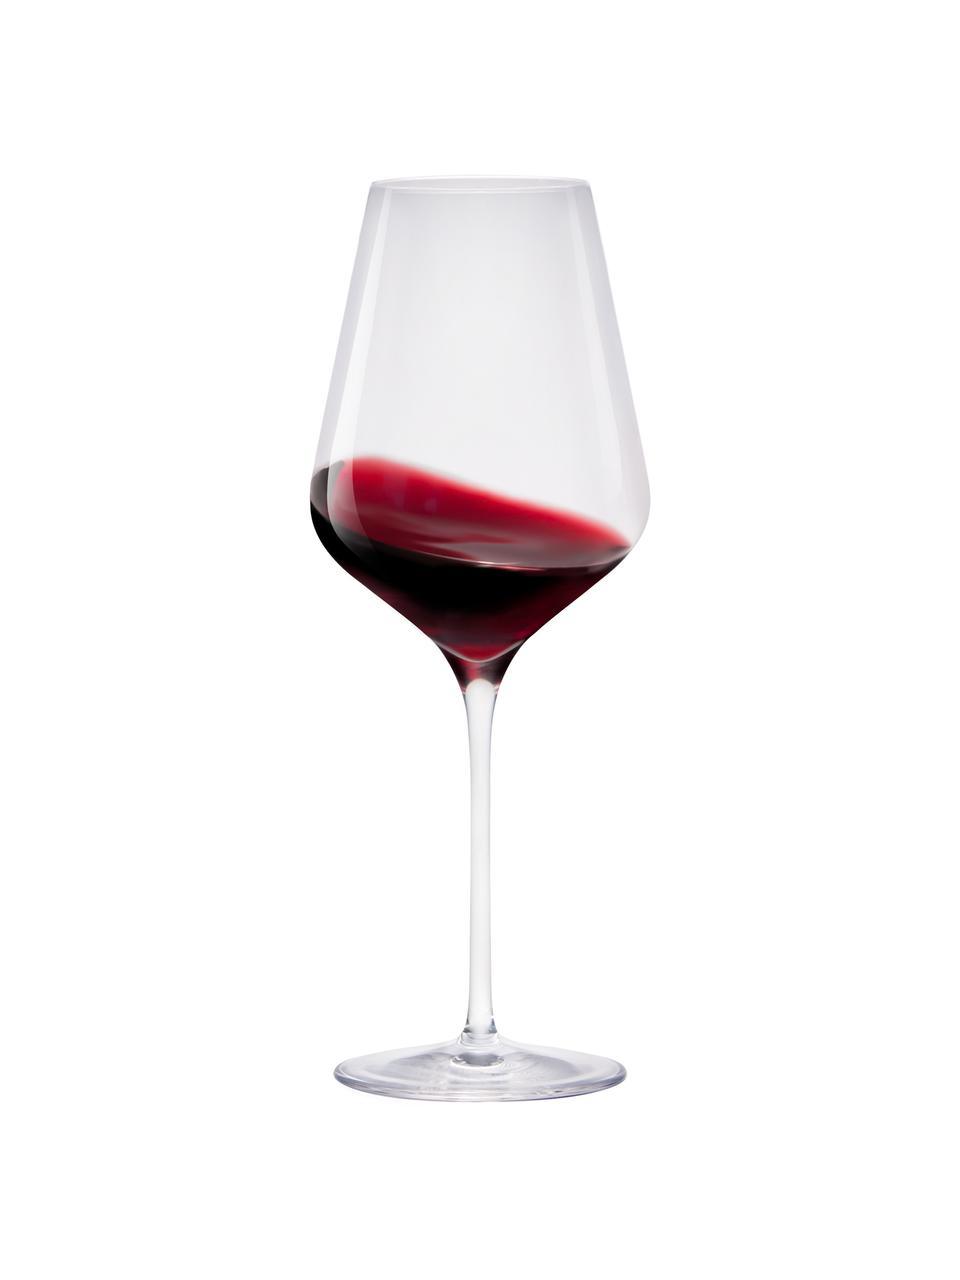 Kristall-Rotweingläser Quatrophil, 6 Stück, Kristallglas, Transparent, Ø 10 x H 25 cm